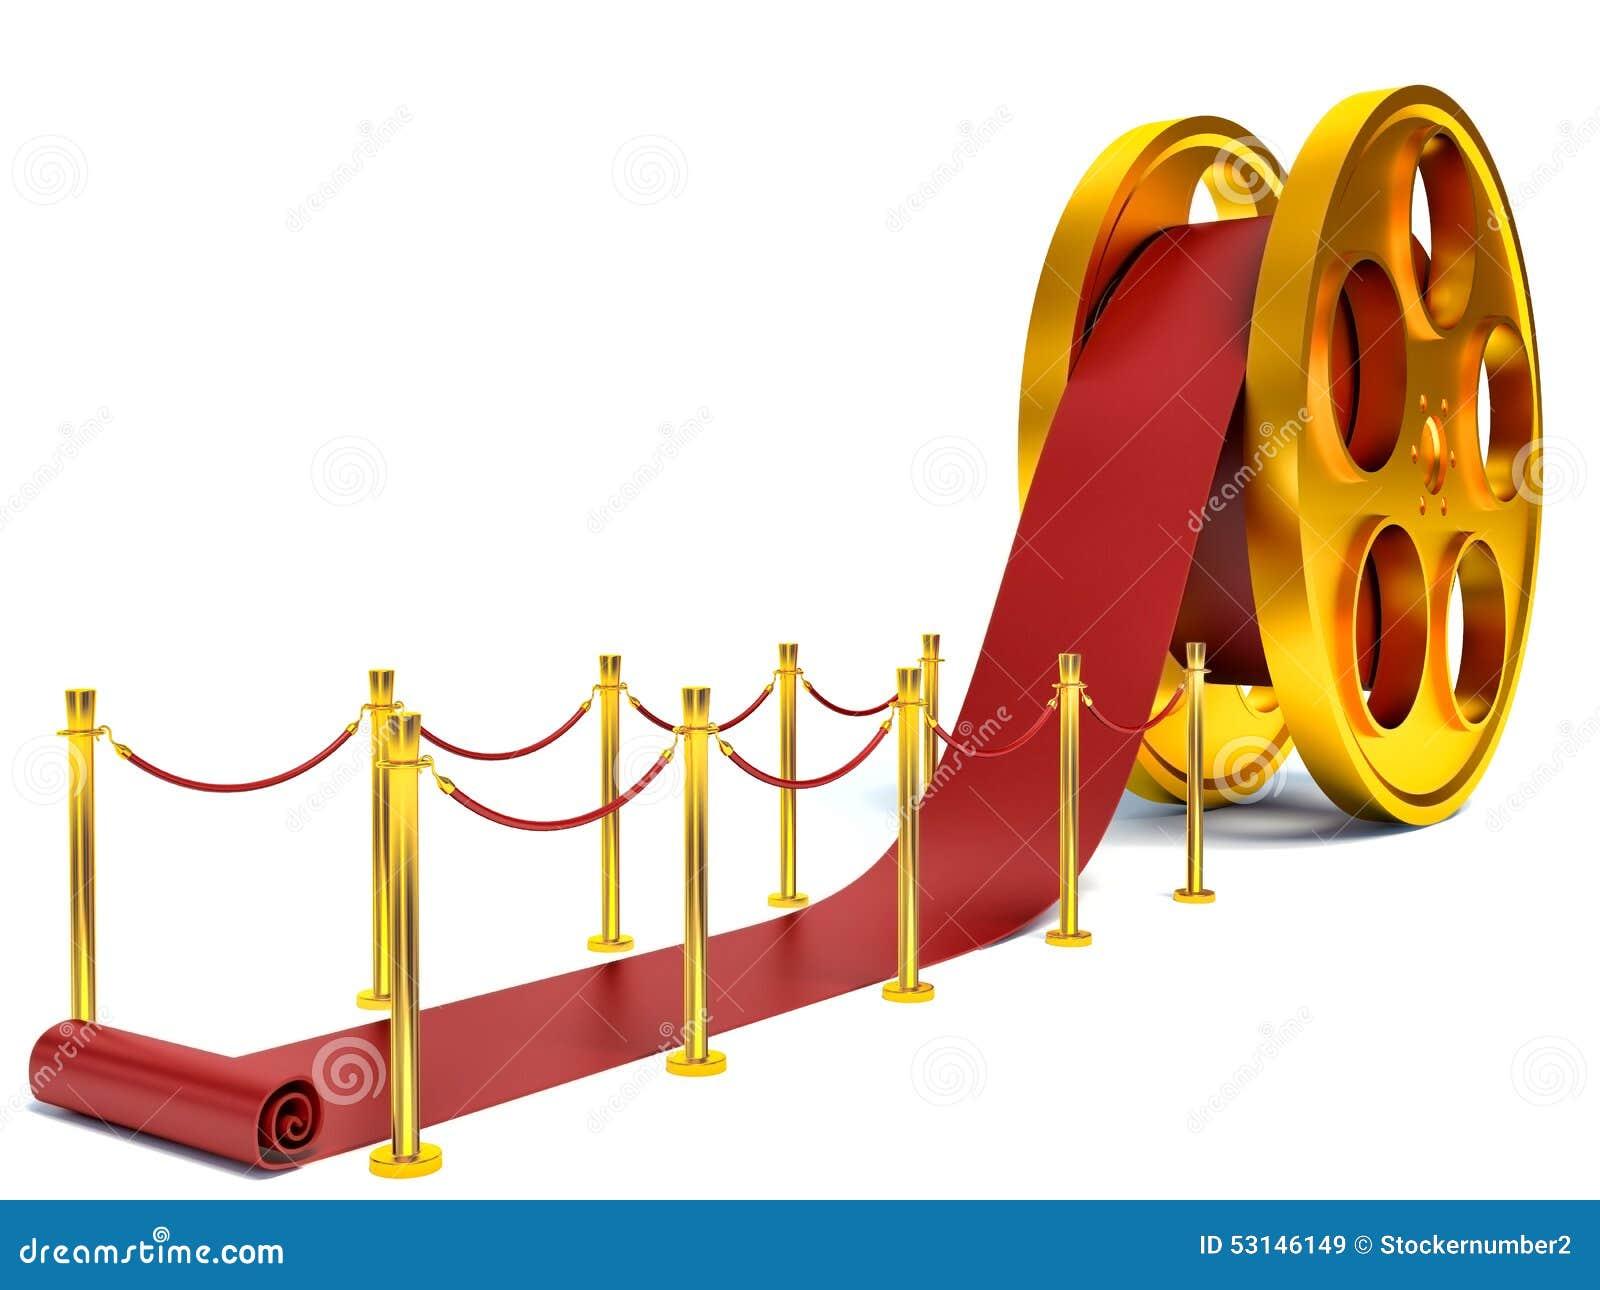 Cinema Film Roll And Red Carpet 3d Illustration Stock